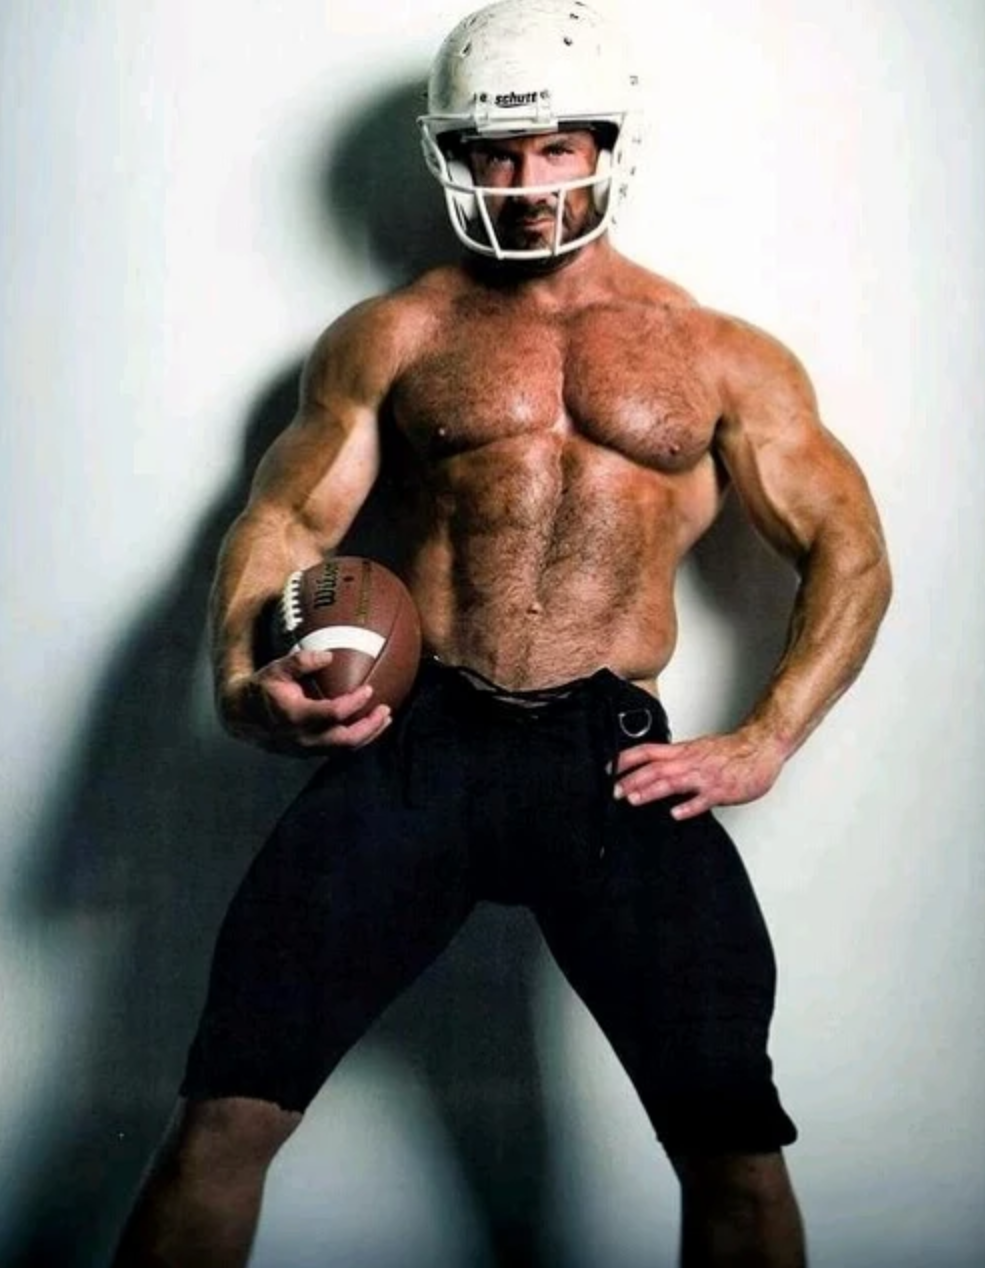 Gay football gear